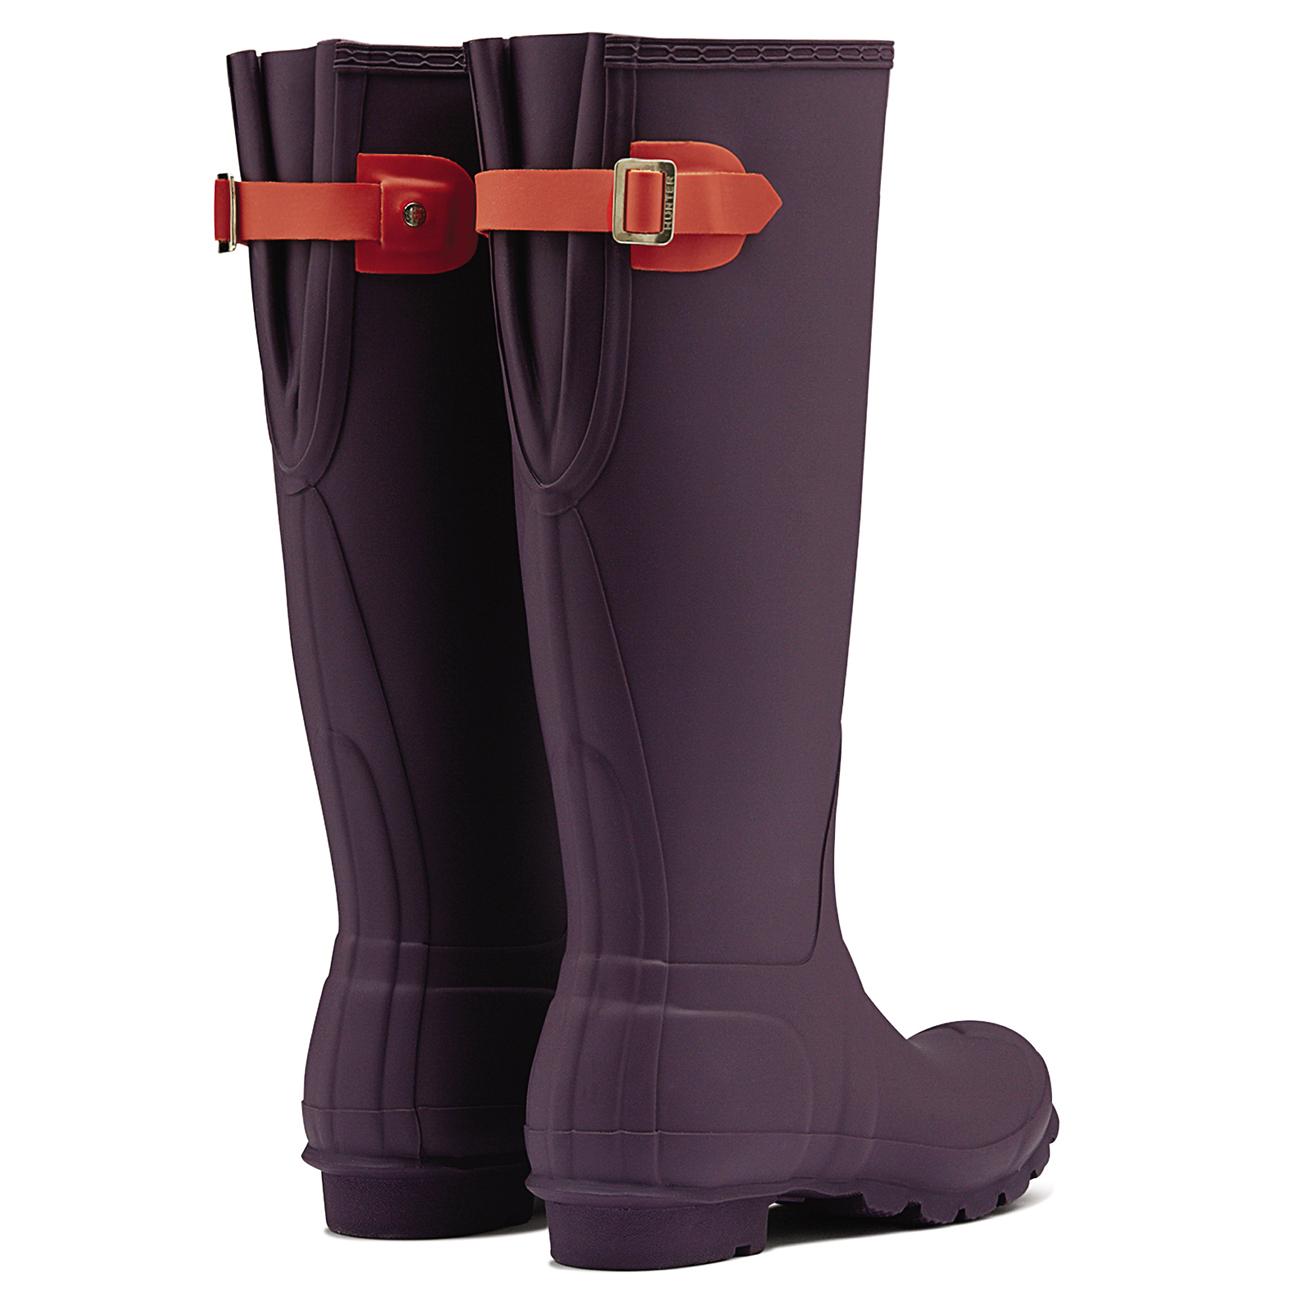 Da Donna Hunter regolabile sul retro Neve Impermeabili Pioggia Tg Gomma Stivali Impermeabili Neve Uk 3-9 410d10